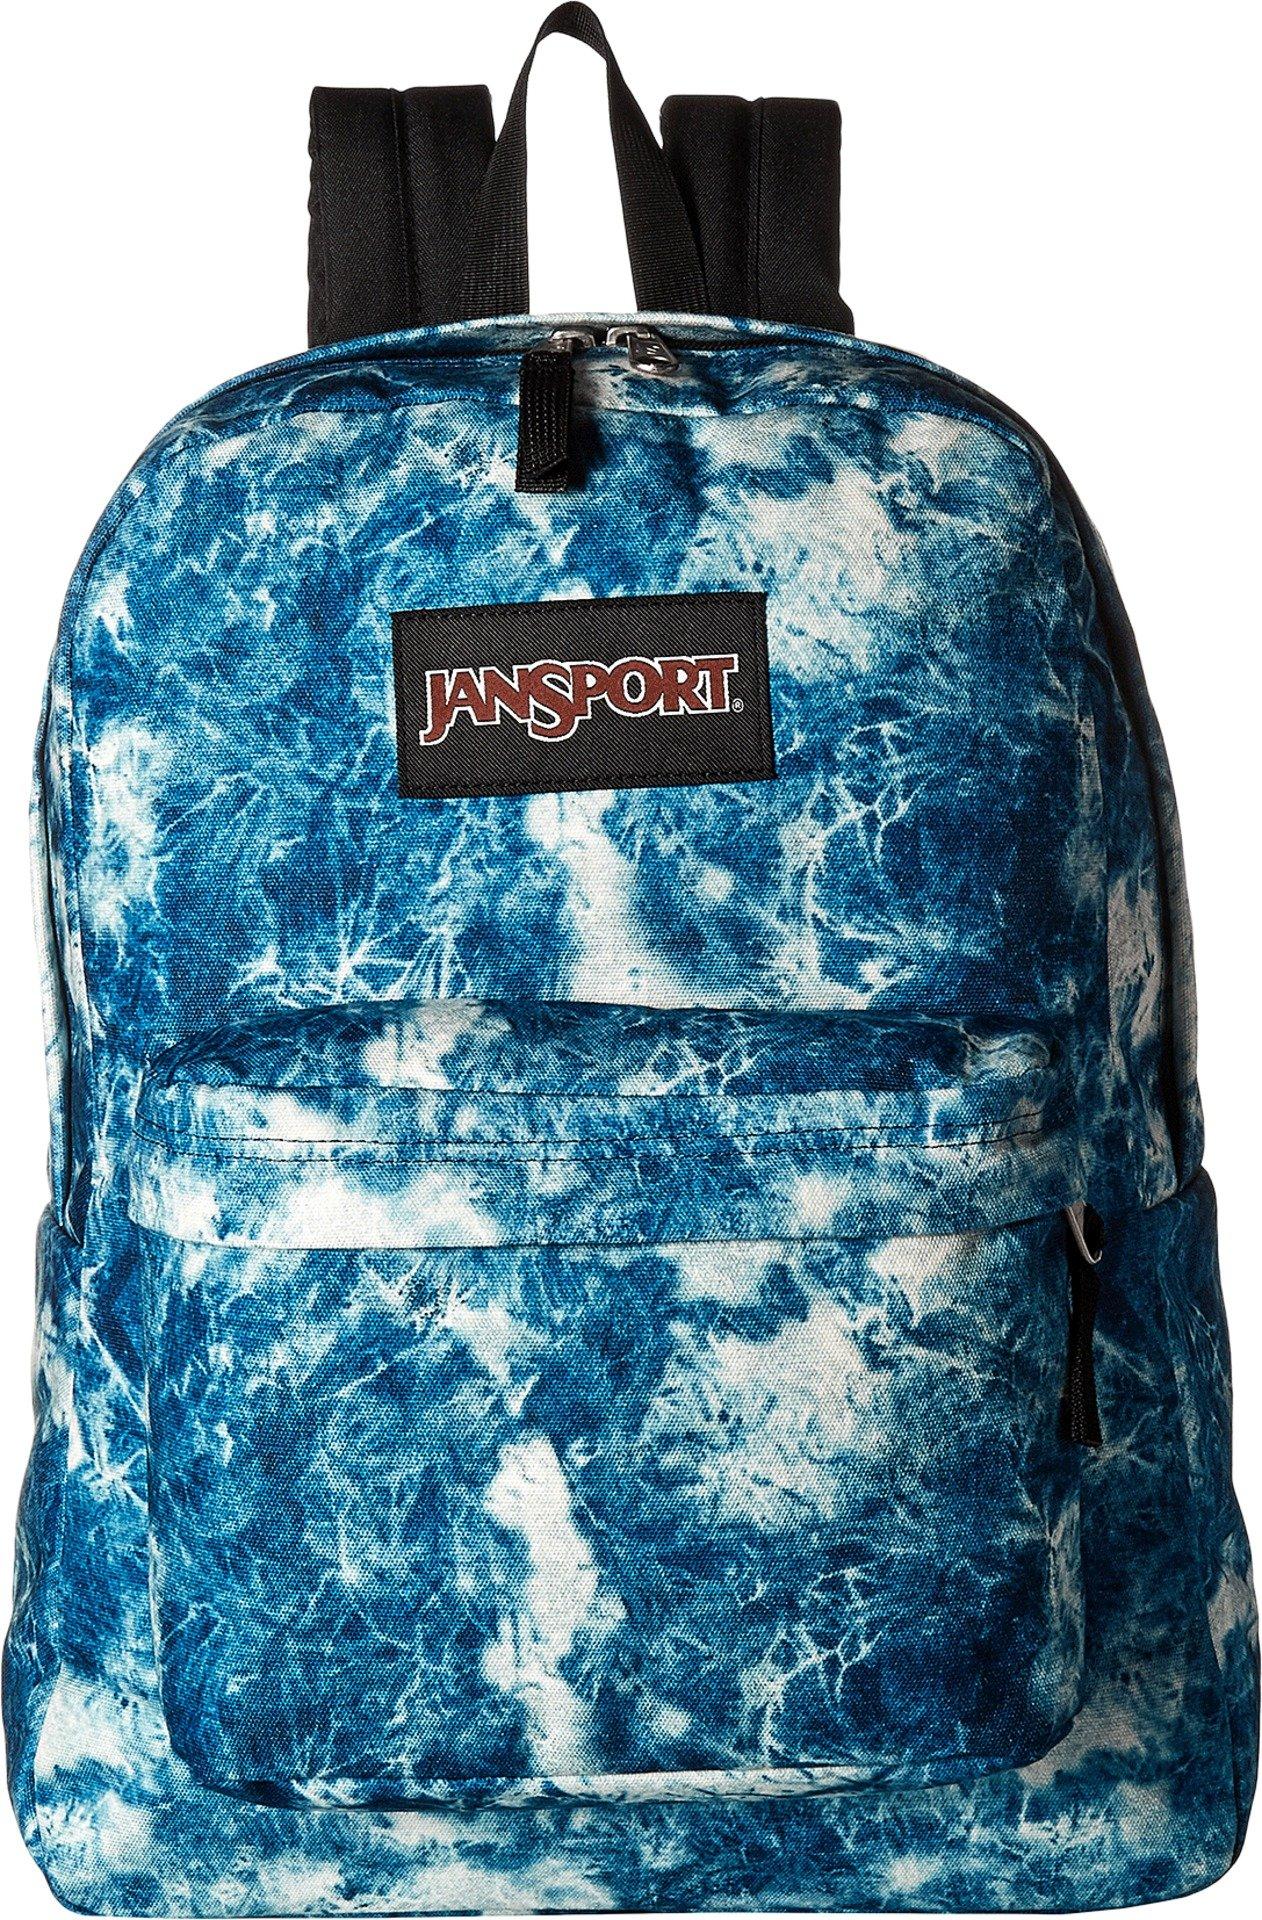 ee7536f4fe12 Get Quotations · JanSport Super FX Series Backpack- Sale Colors